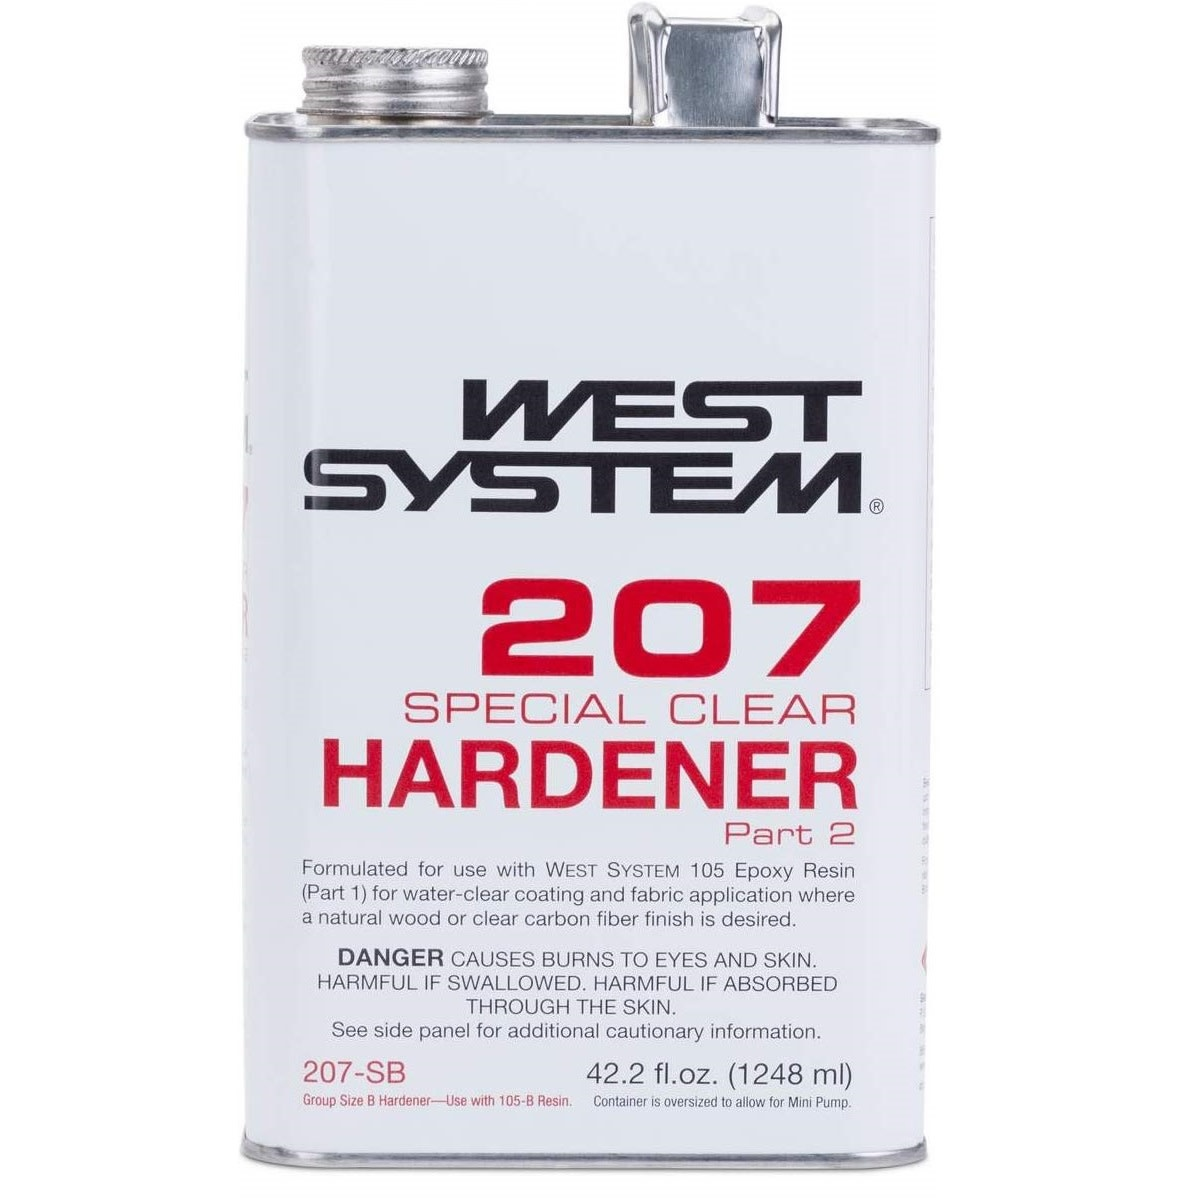 West System 207SB Special Clear Hardener 42.2oz